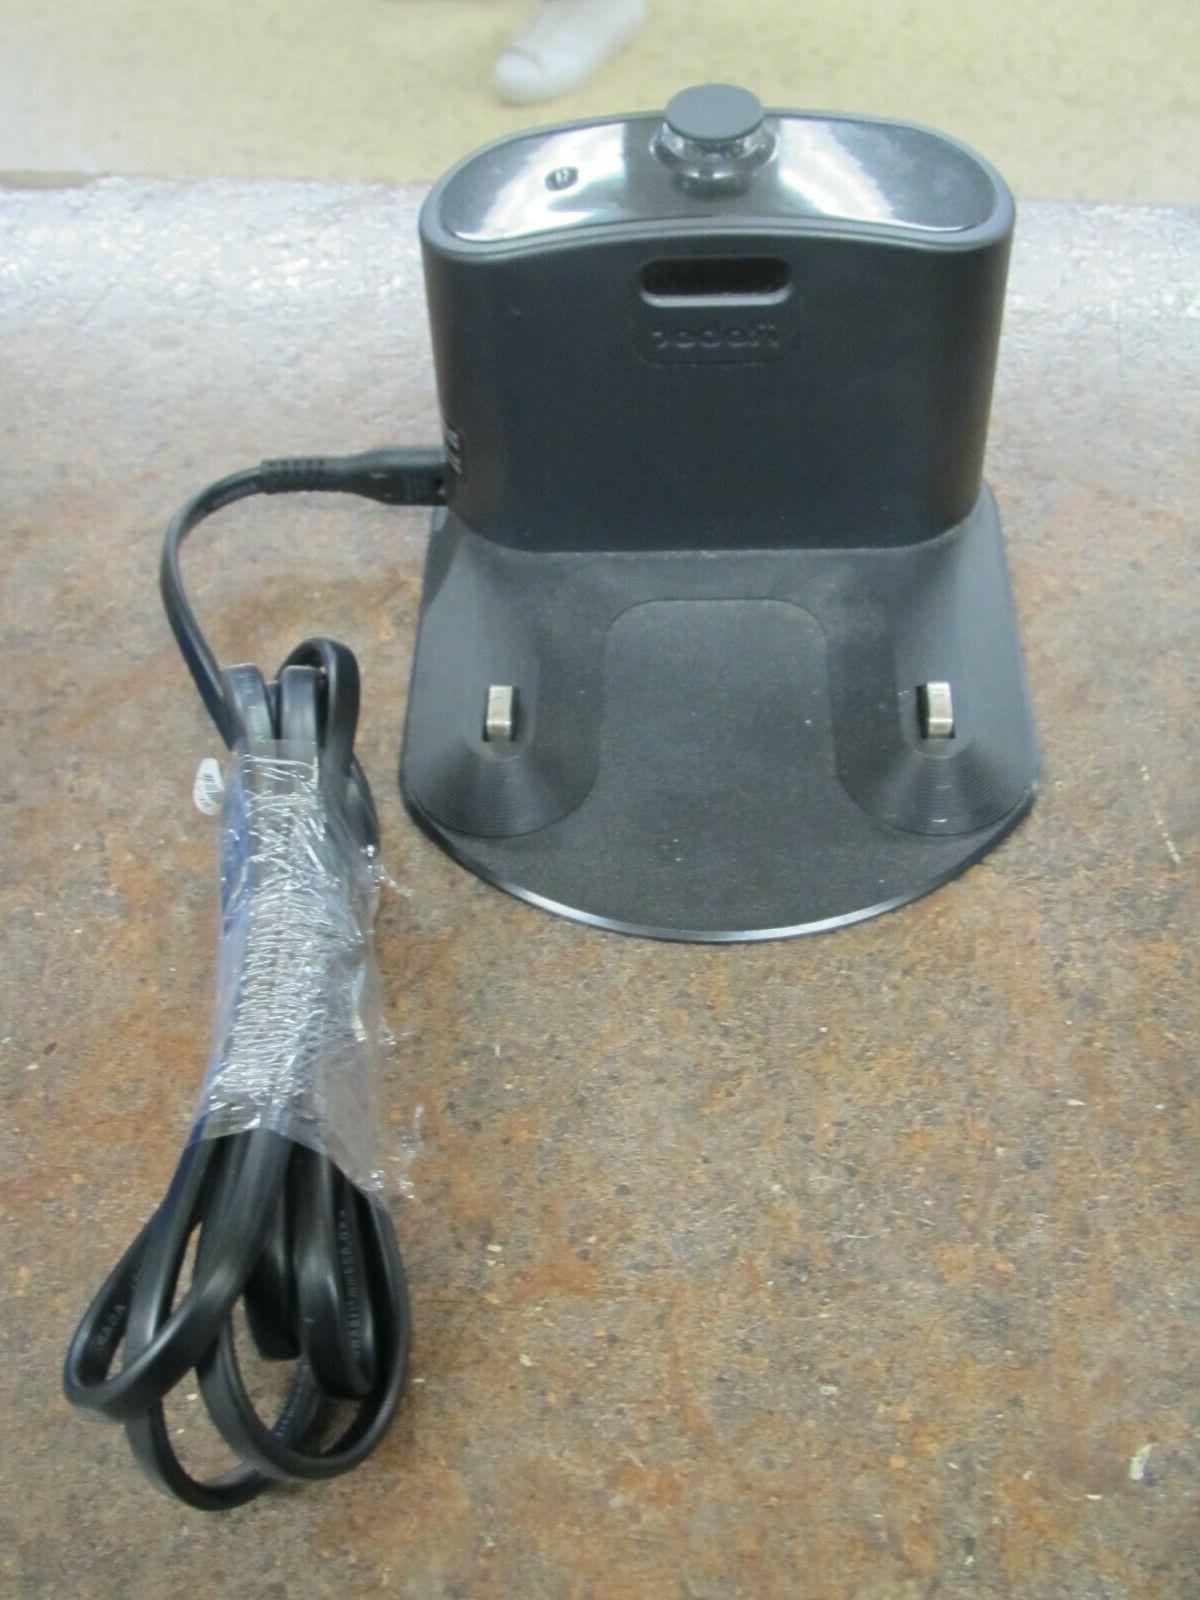 iRobot Roomba Robot Vacuum w